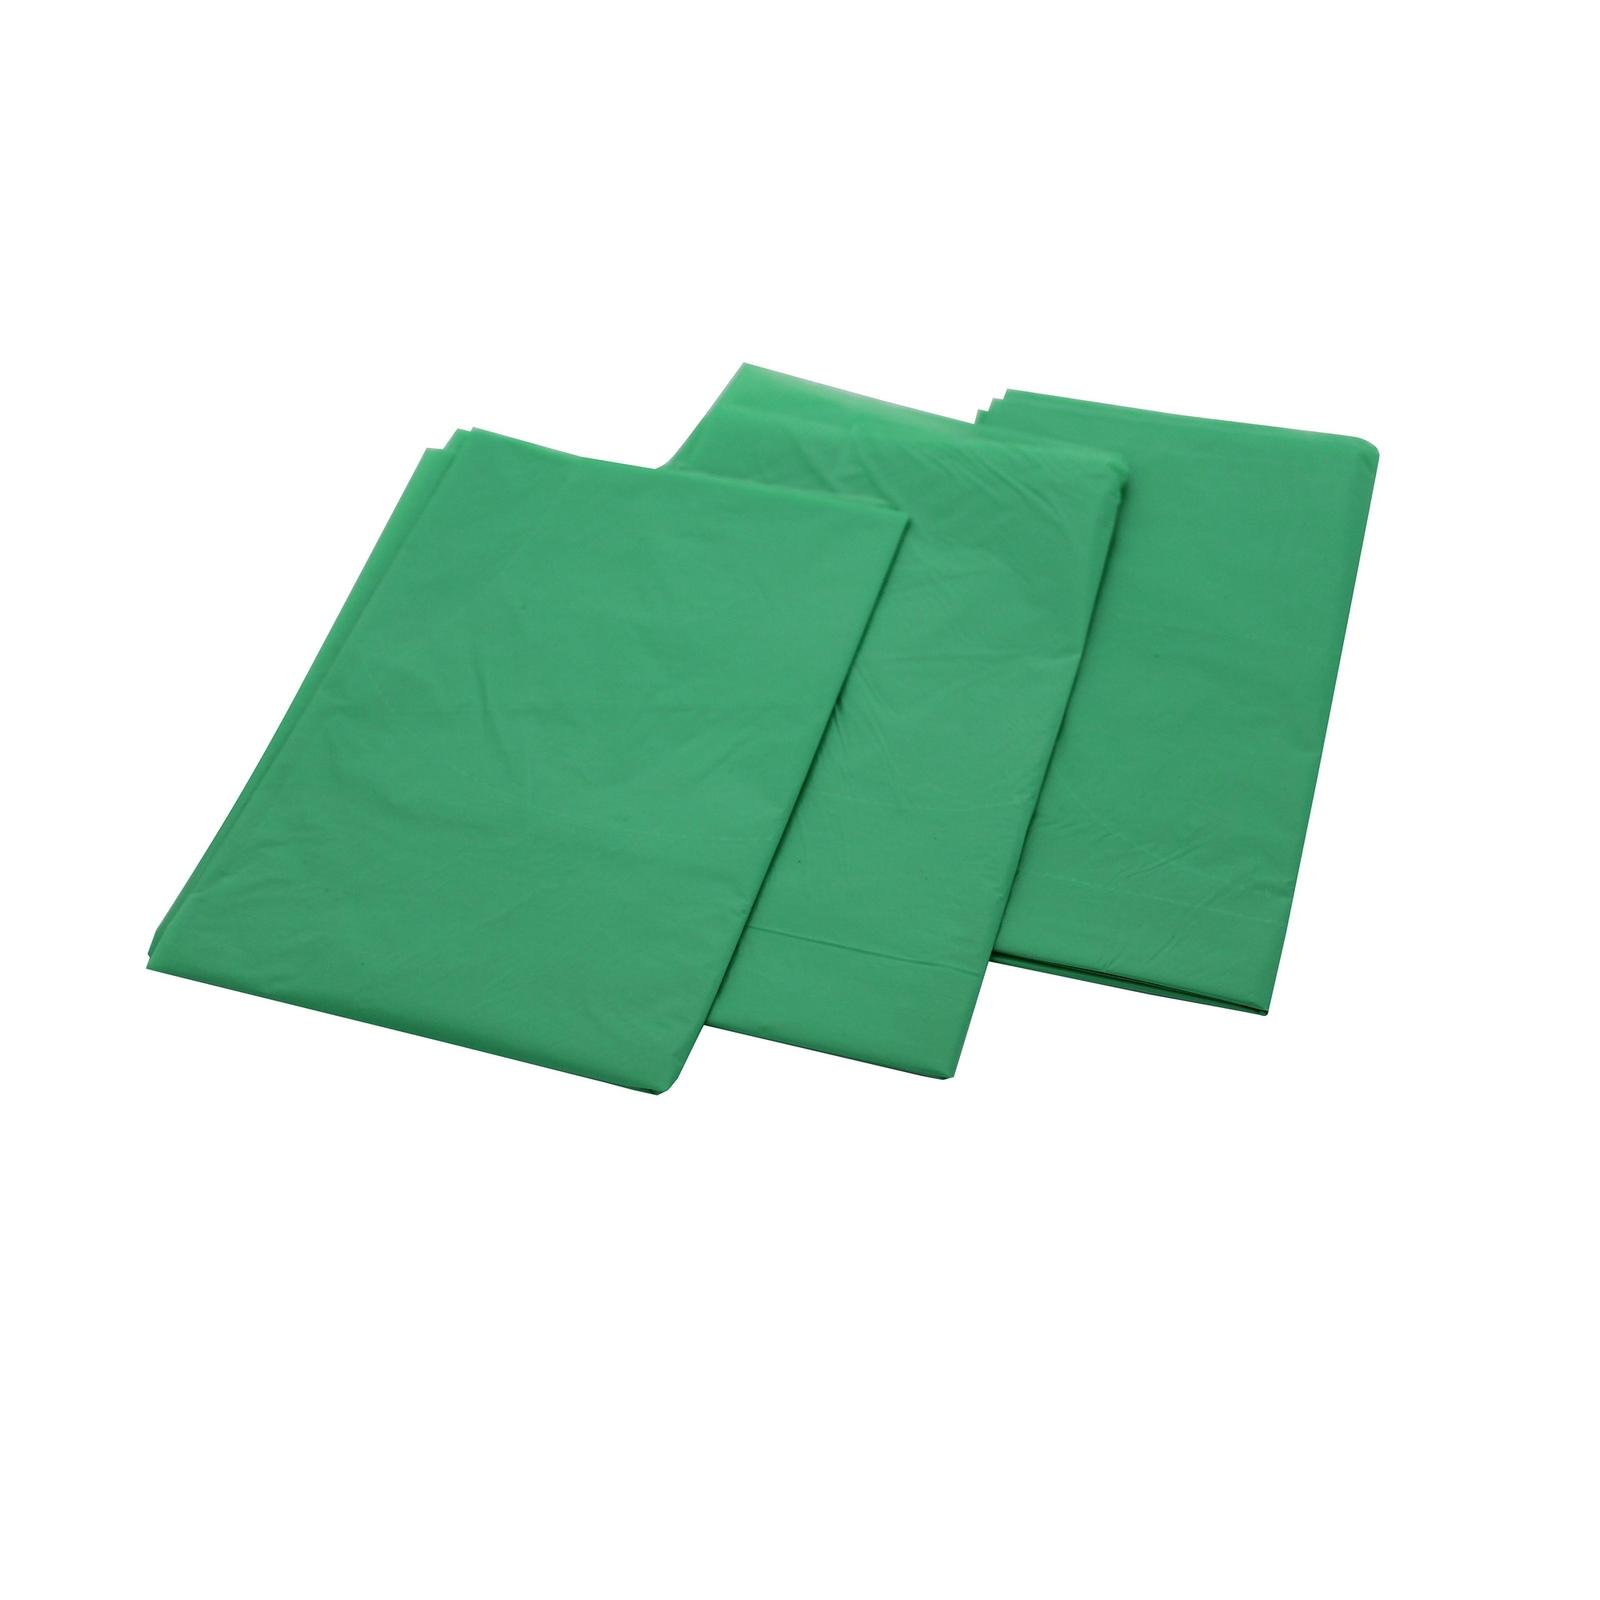 Coloured Refuse Sacks - Green